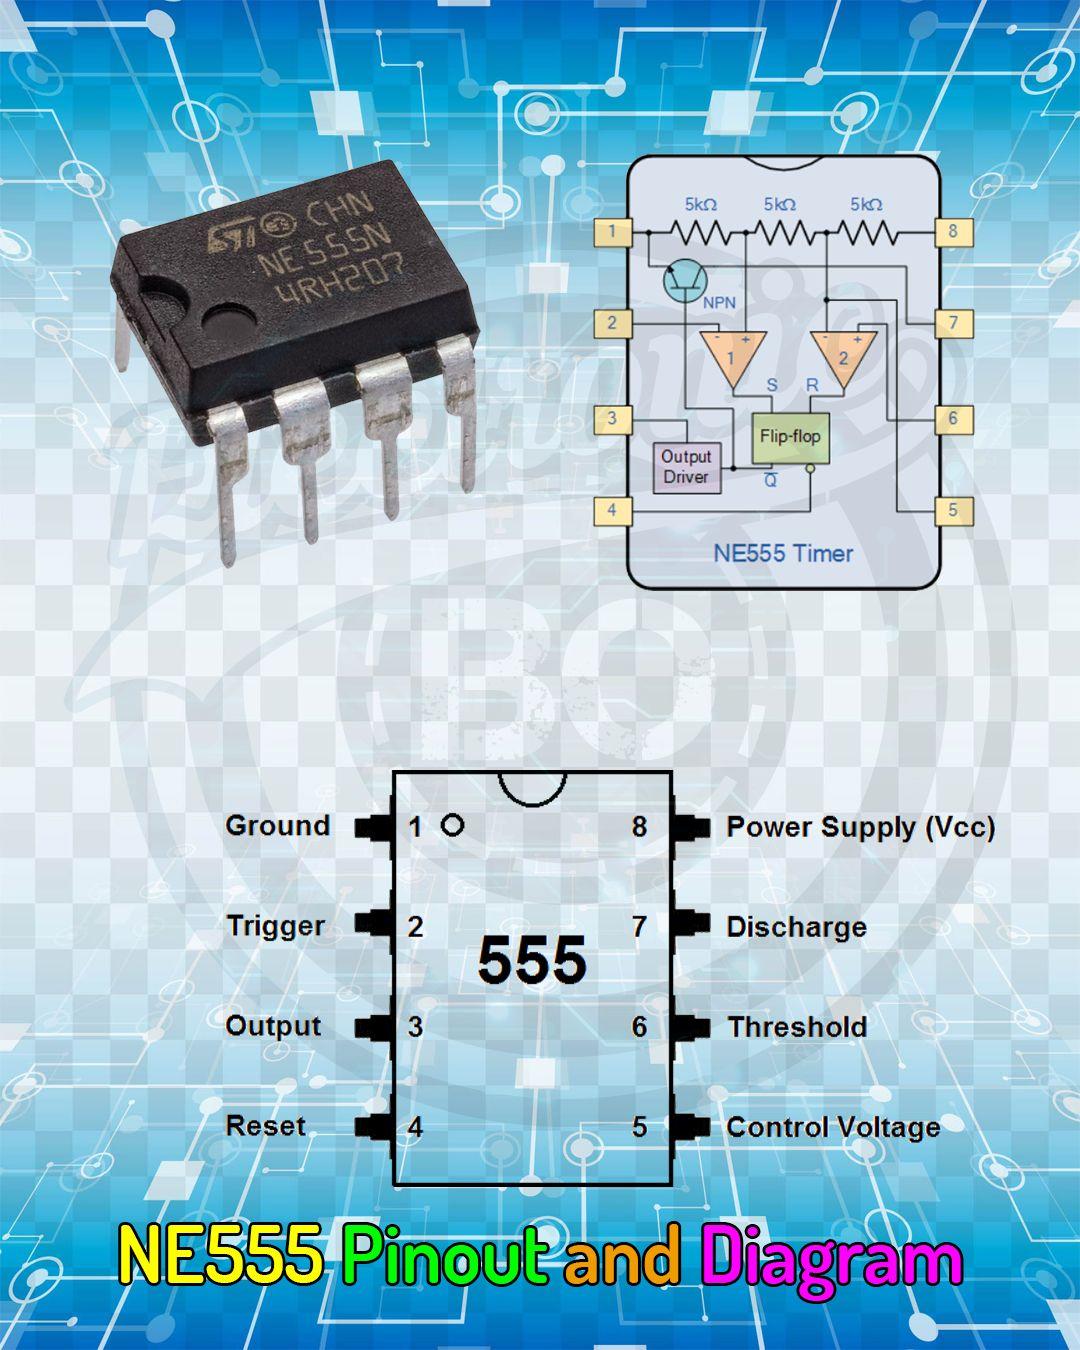 medium resolution of ne555 pinout and diagram